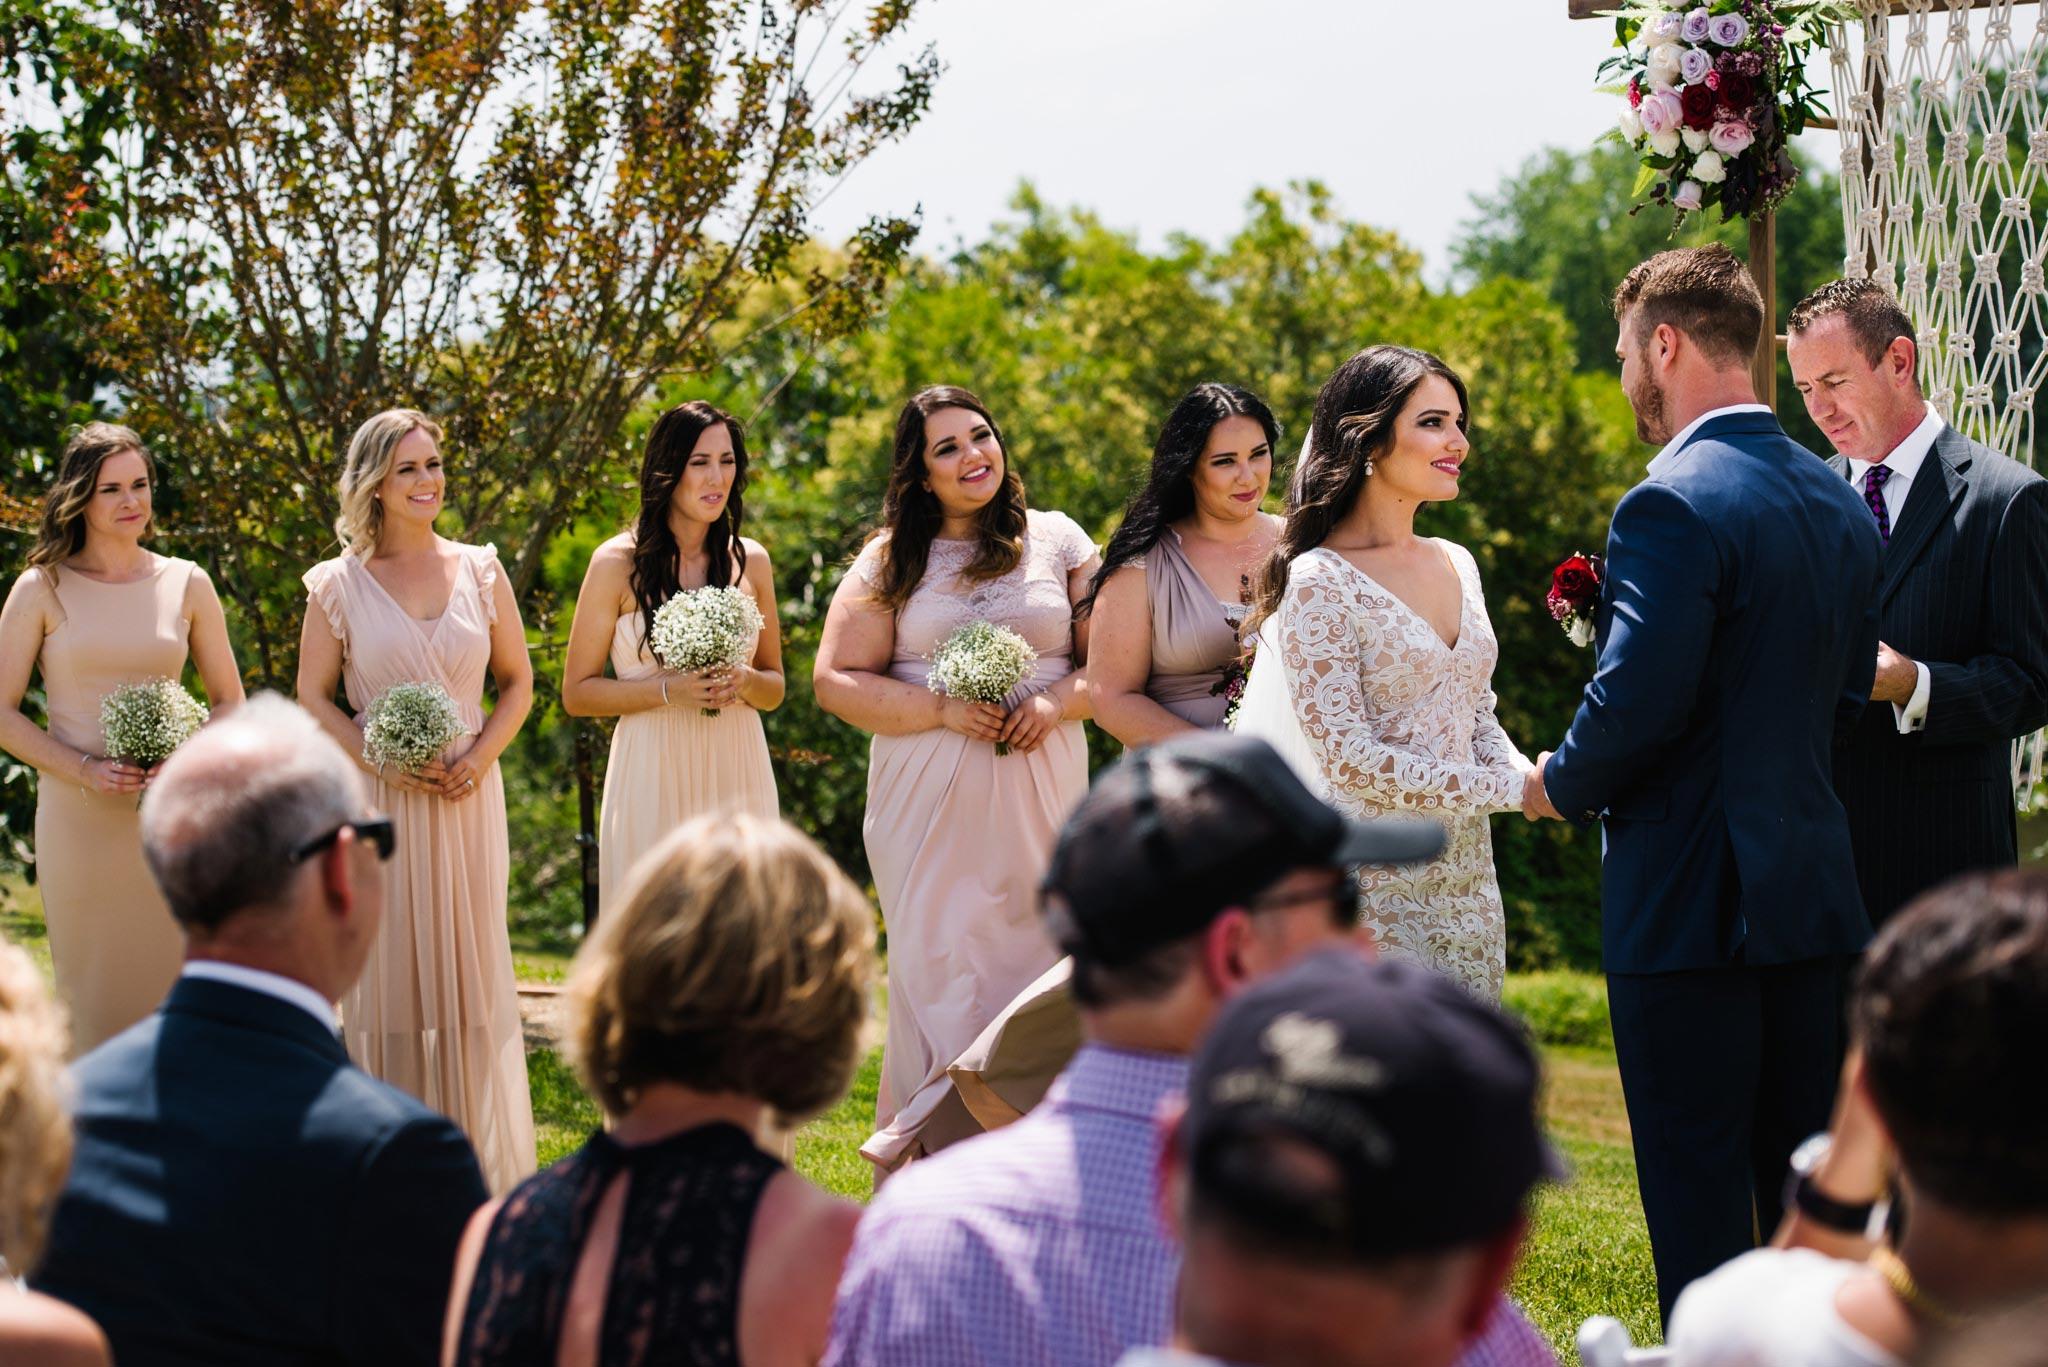 Outdoor-wedding-ceremony-Cornwallis-House.jpg